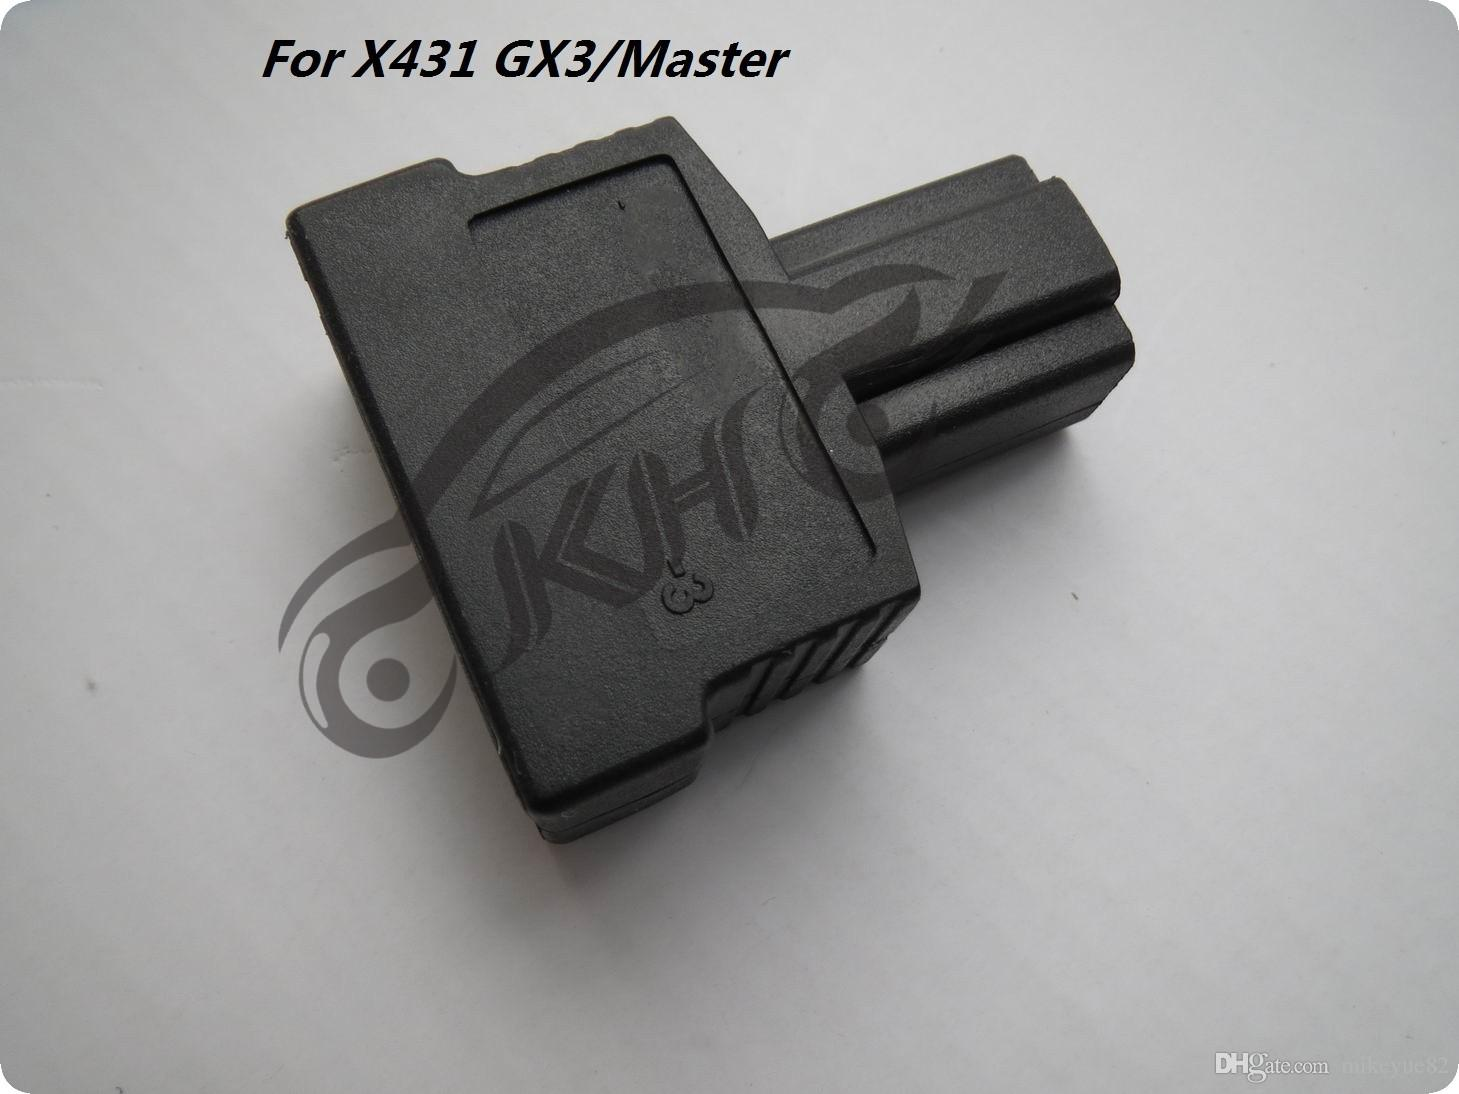 100% Original for LAUNCH X431 GX3 Maste for Honda-3 Pins OBDII Adaptor -3 Pin OBD-II Connector OBD II Connecter OBD2 Adapter